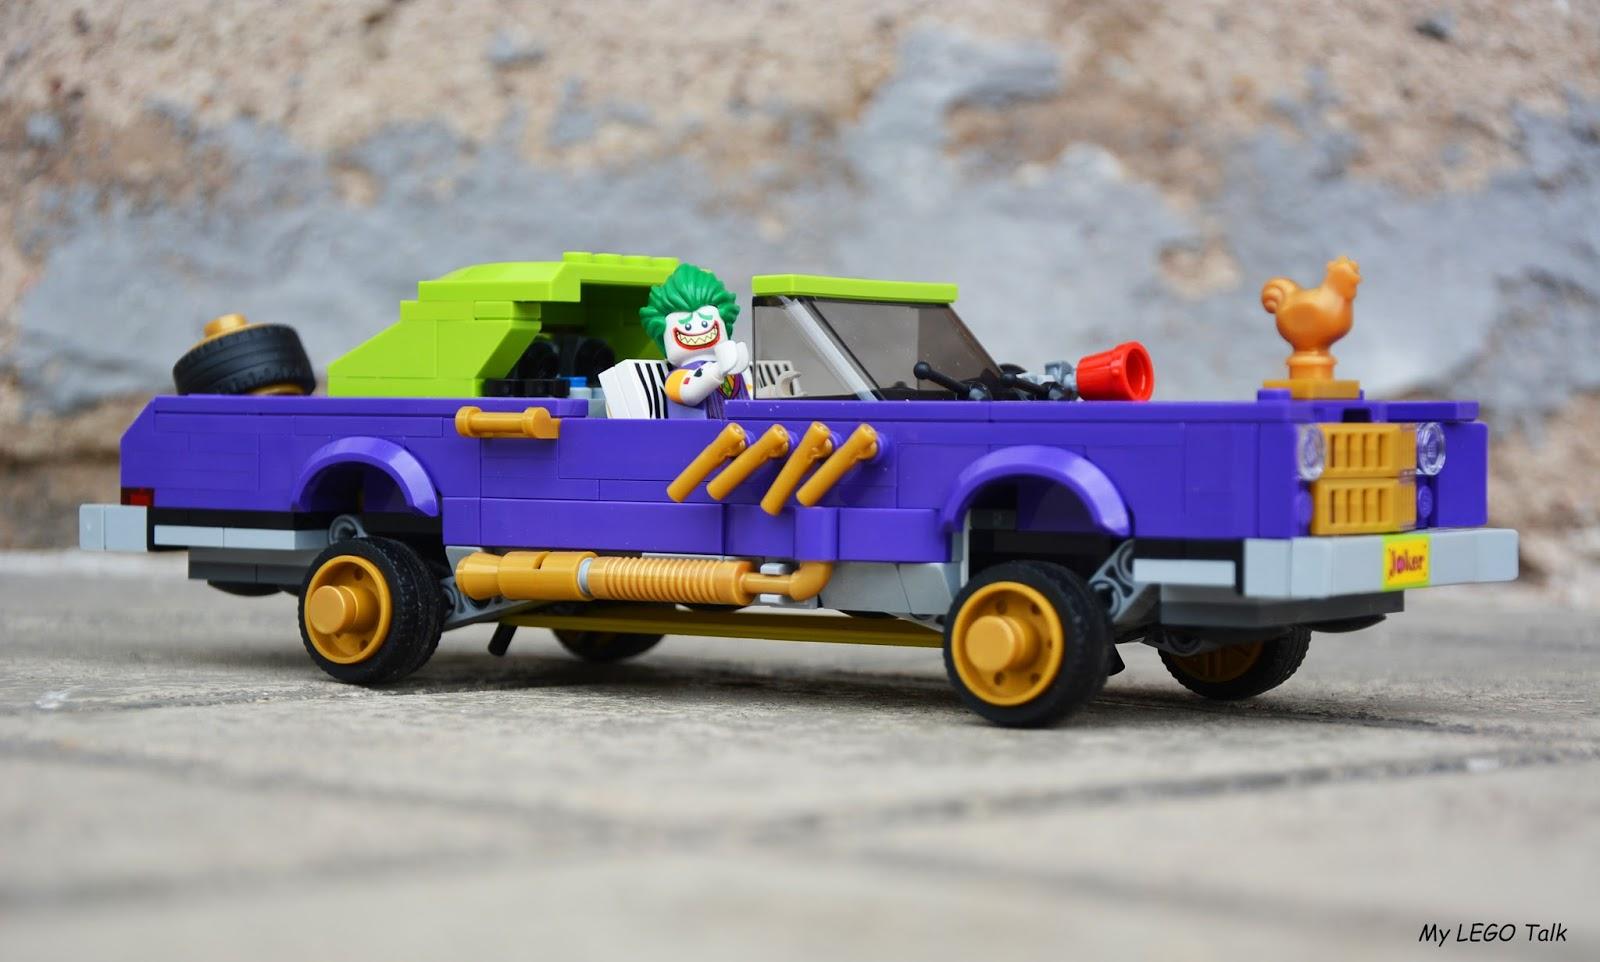 set 70906 the joker notorious lowrider my lego talk. Black Bedroom Furniture Sets. Home Design Ideas